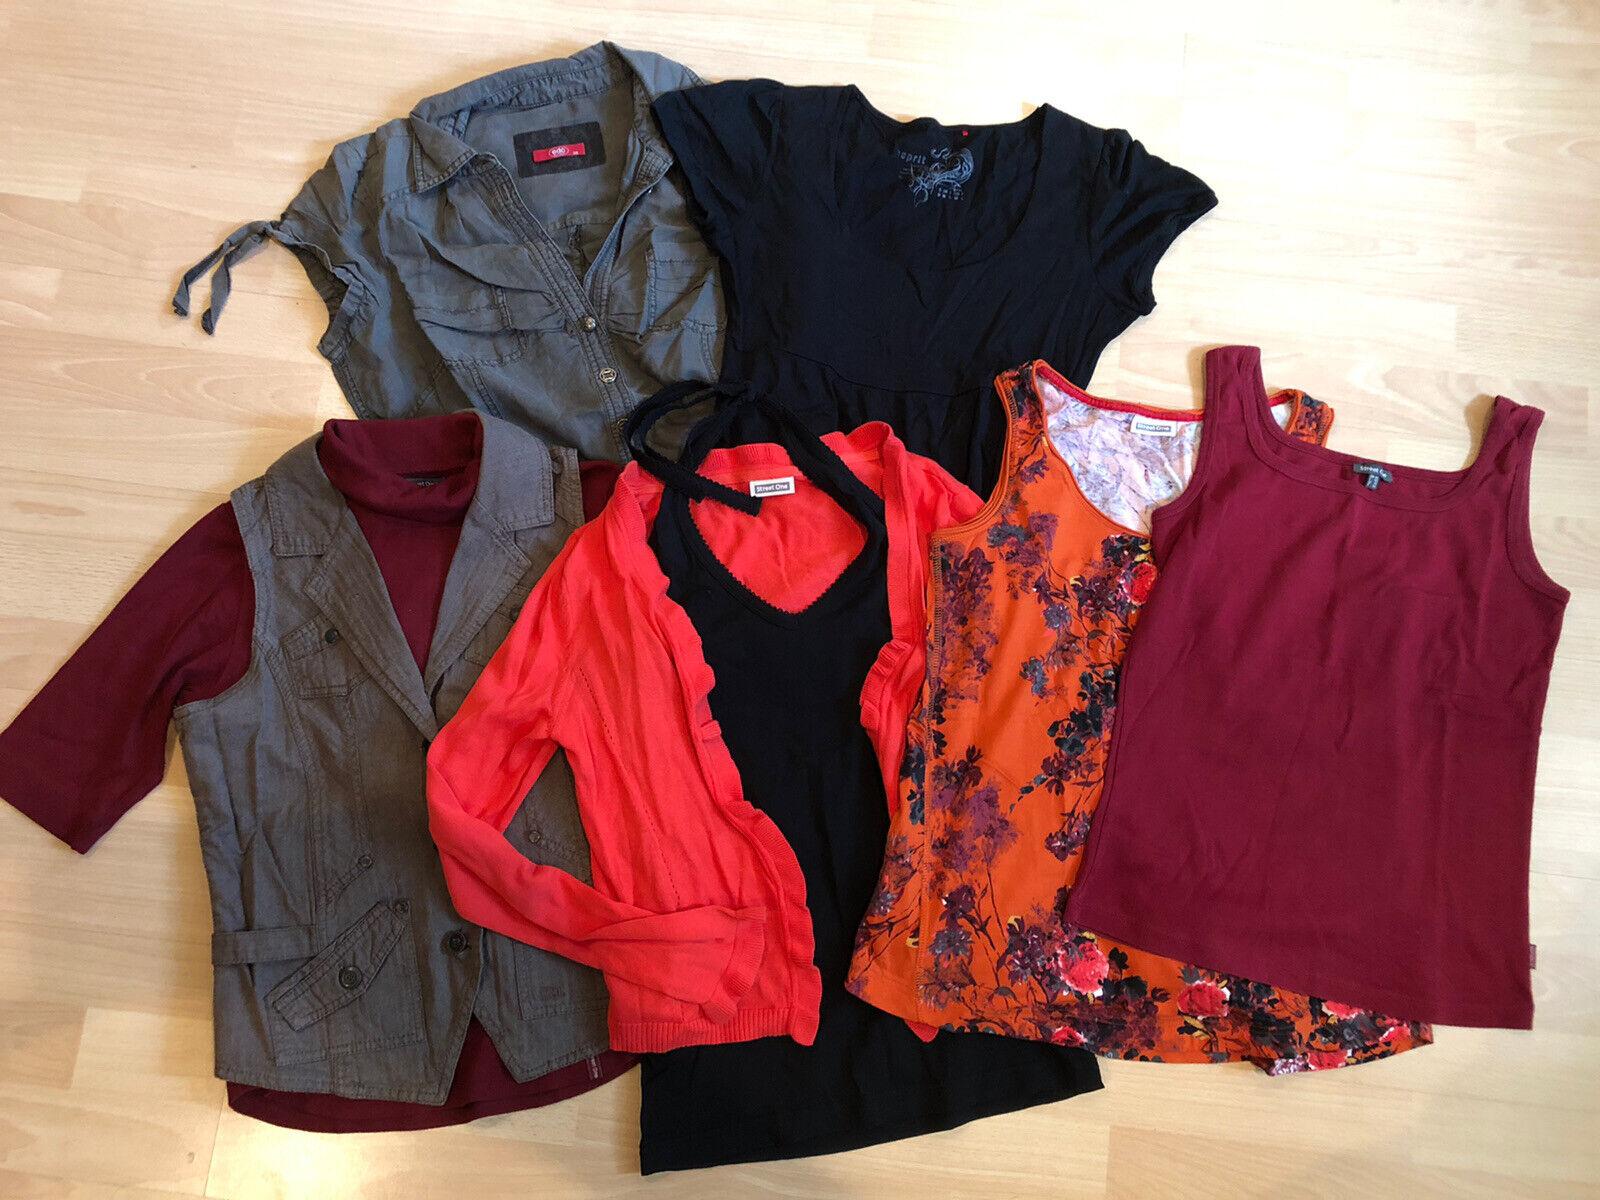 SET Street One, Esprit Gr. 38 M Shirt Kleid Top 8 Teile